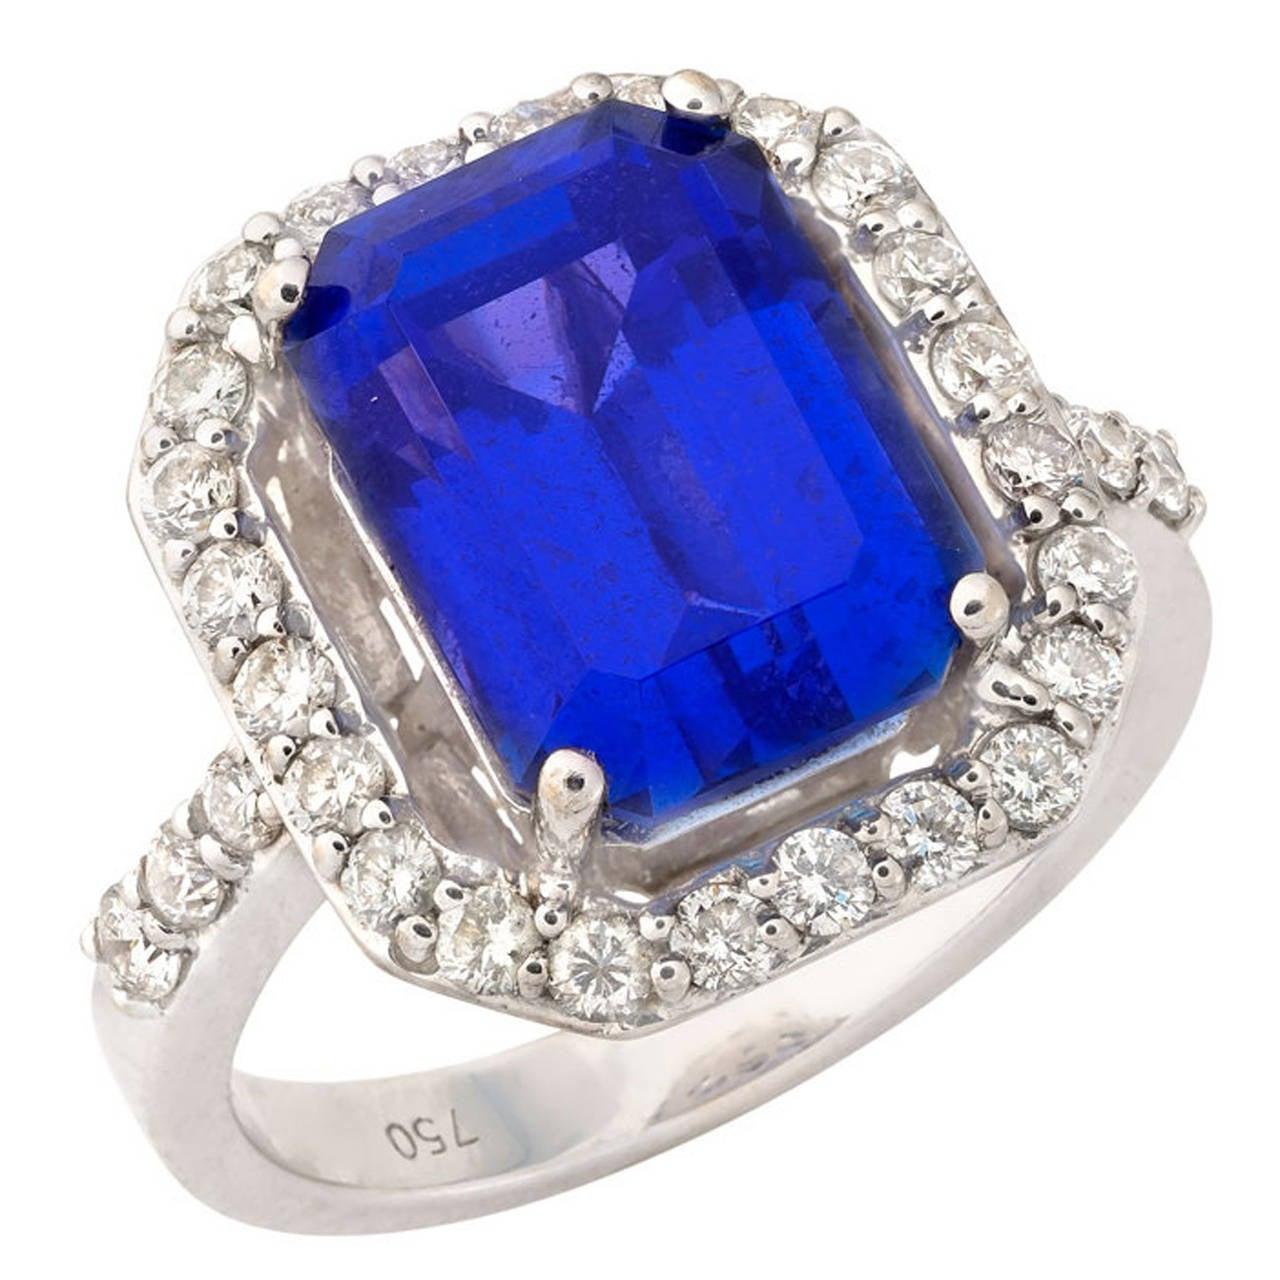 emerald cut tanzanite gold engagement ring